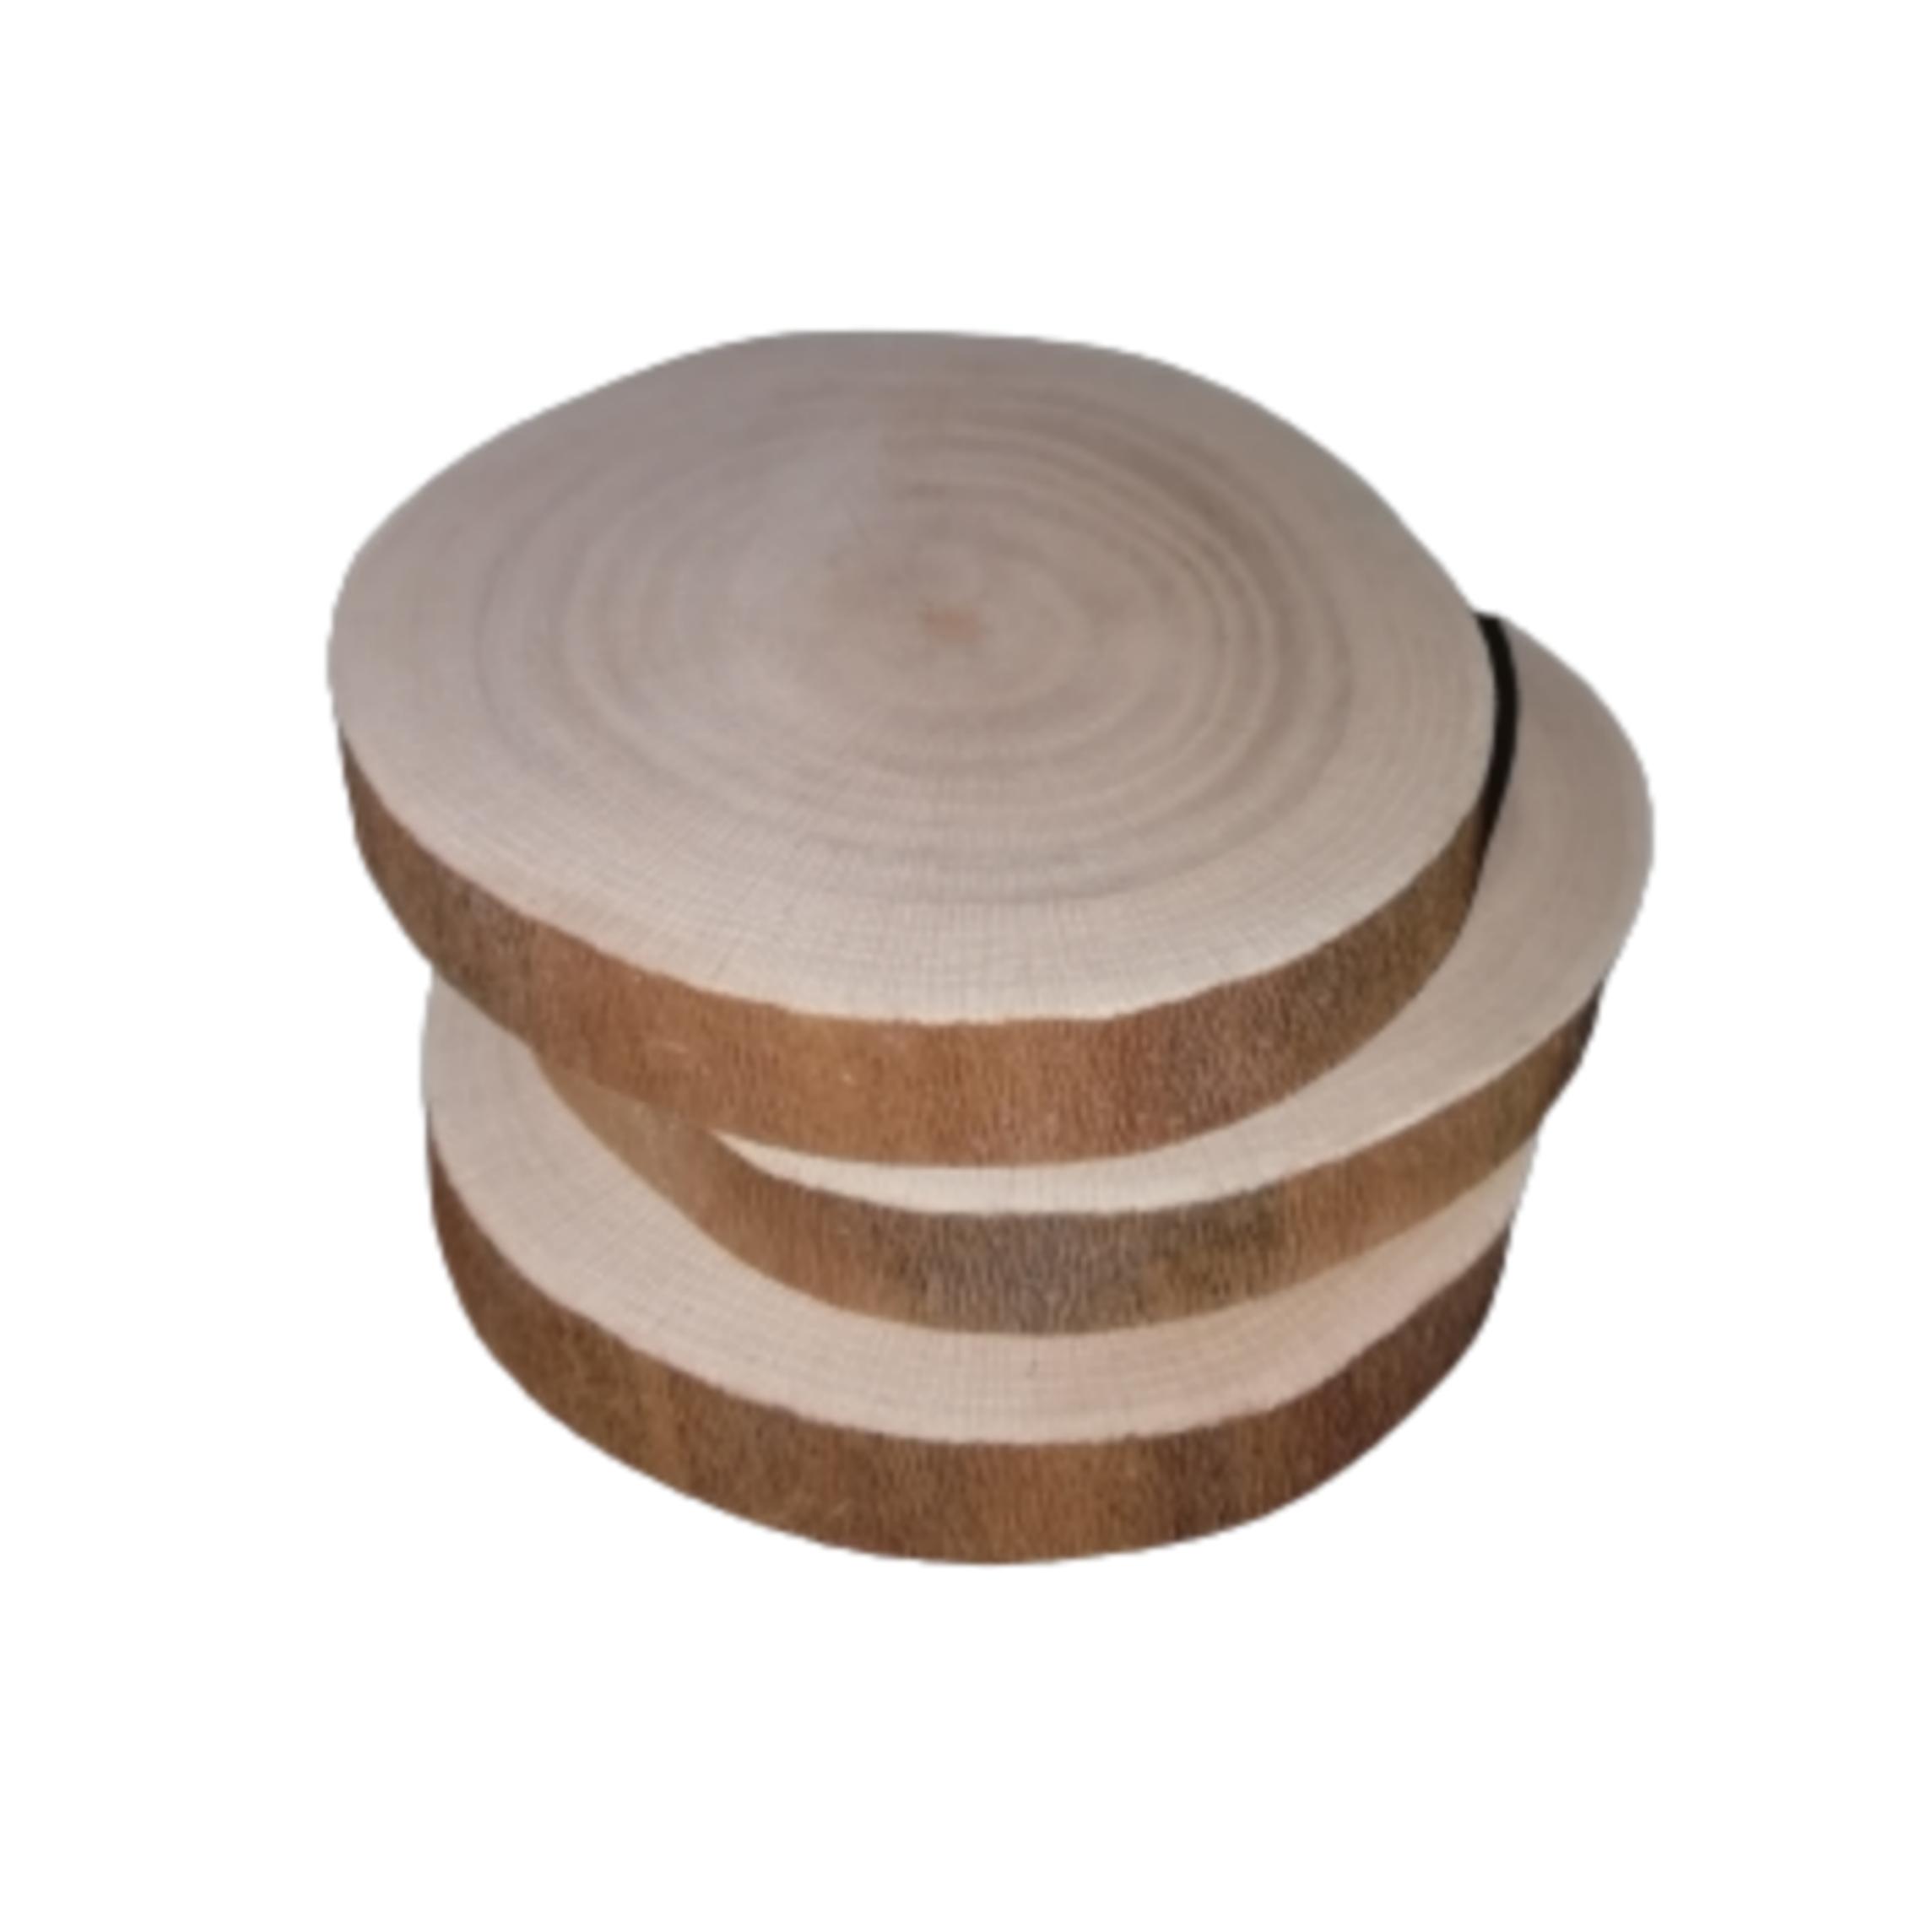 تخته چوب کد 771بسته 3 عددی